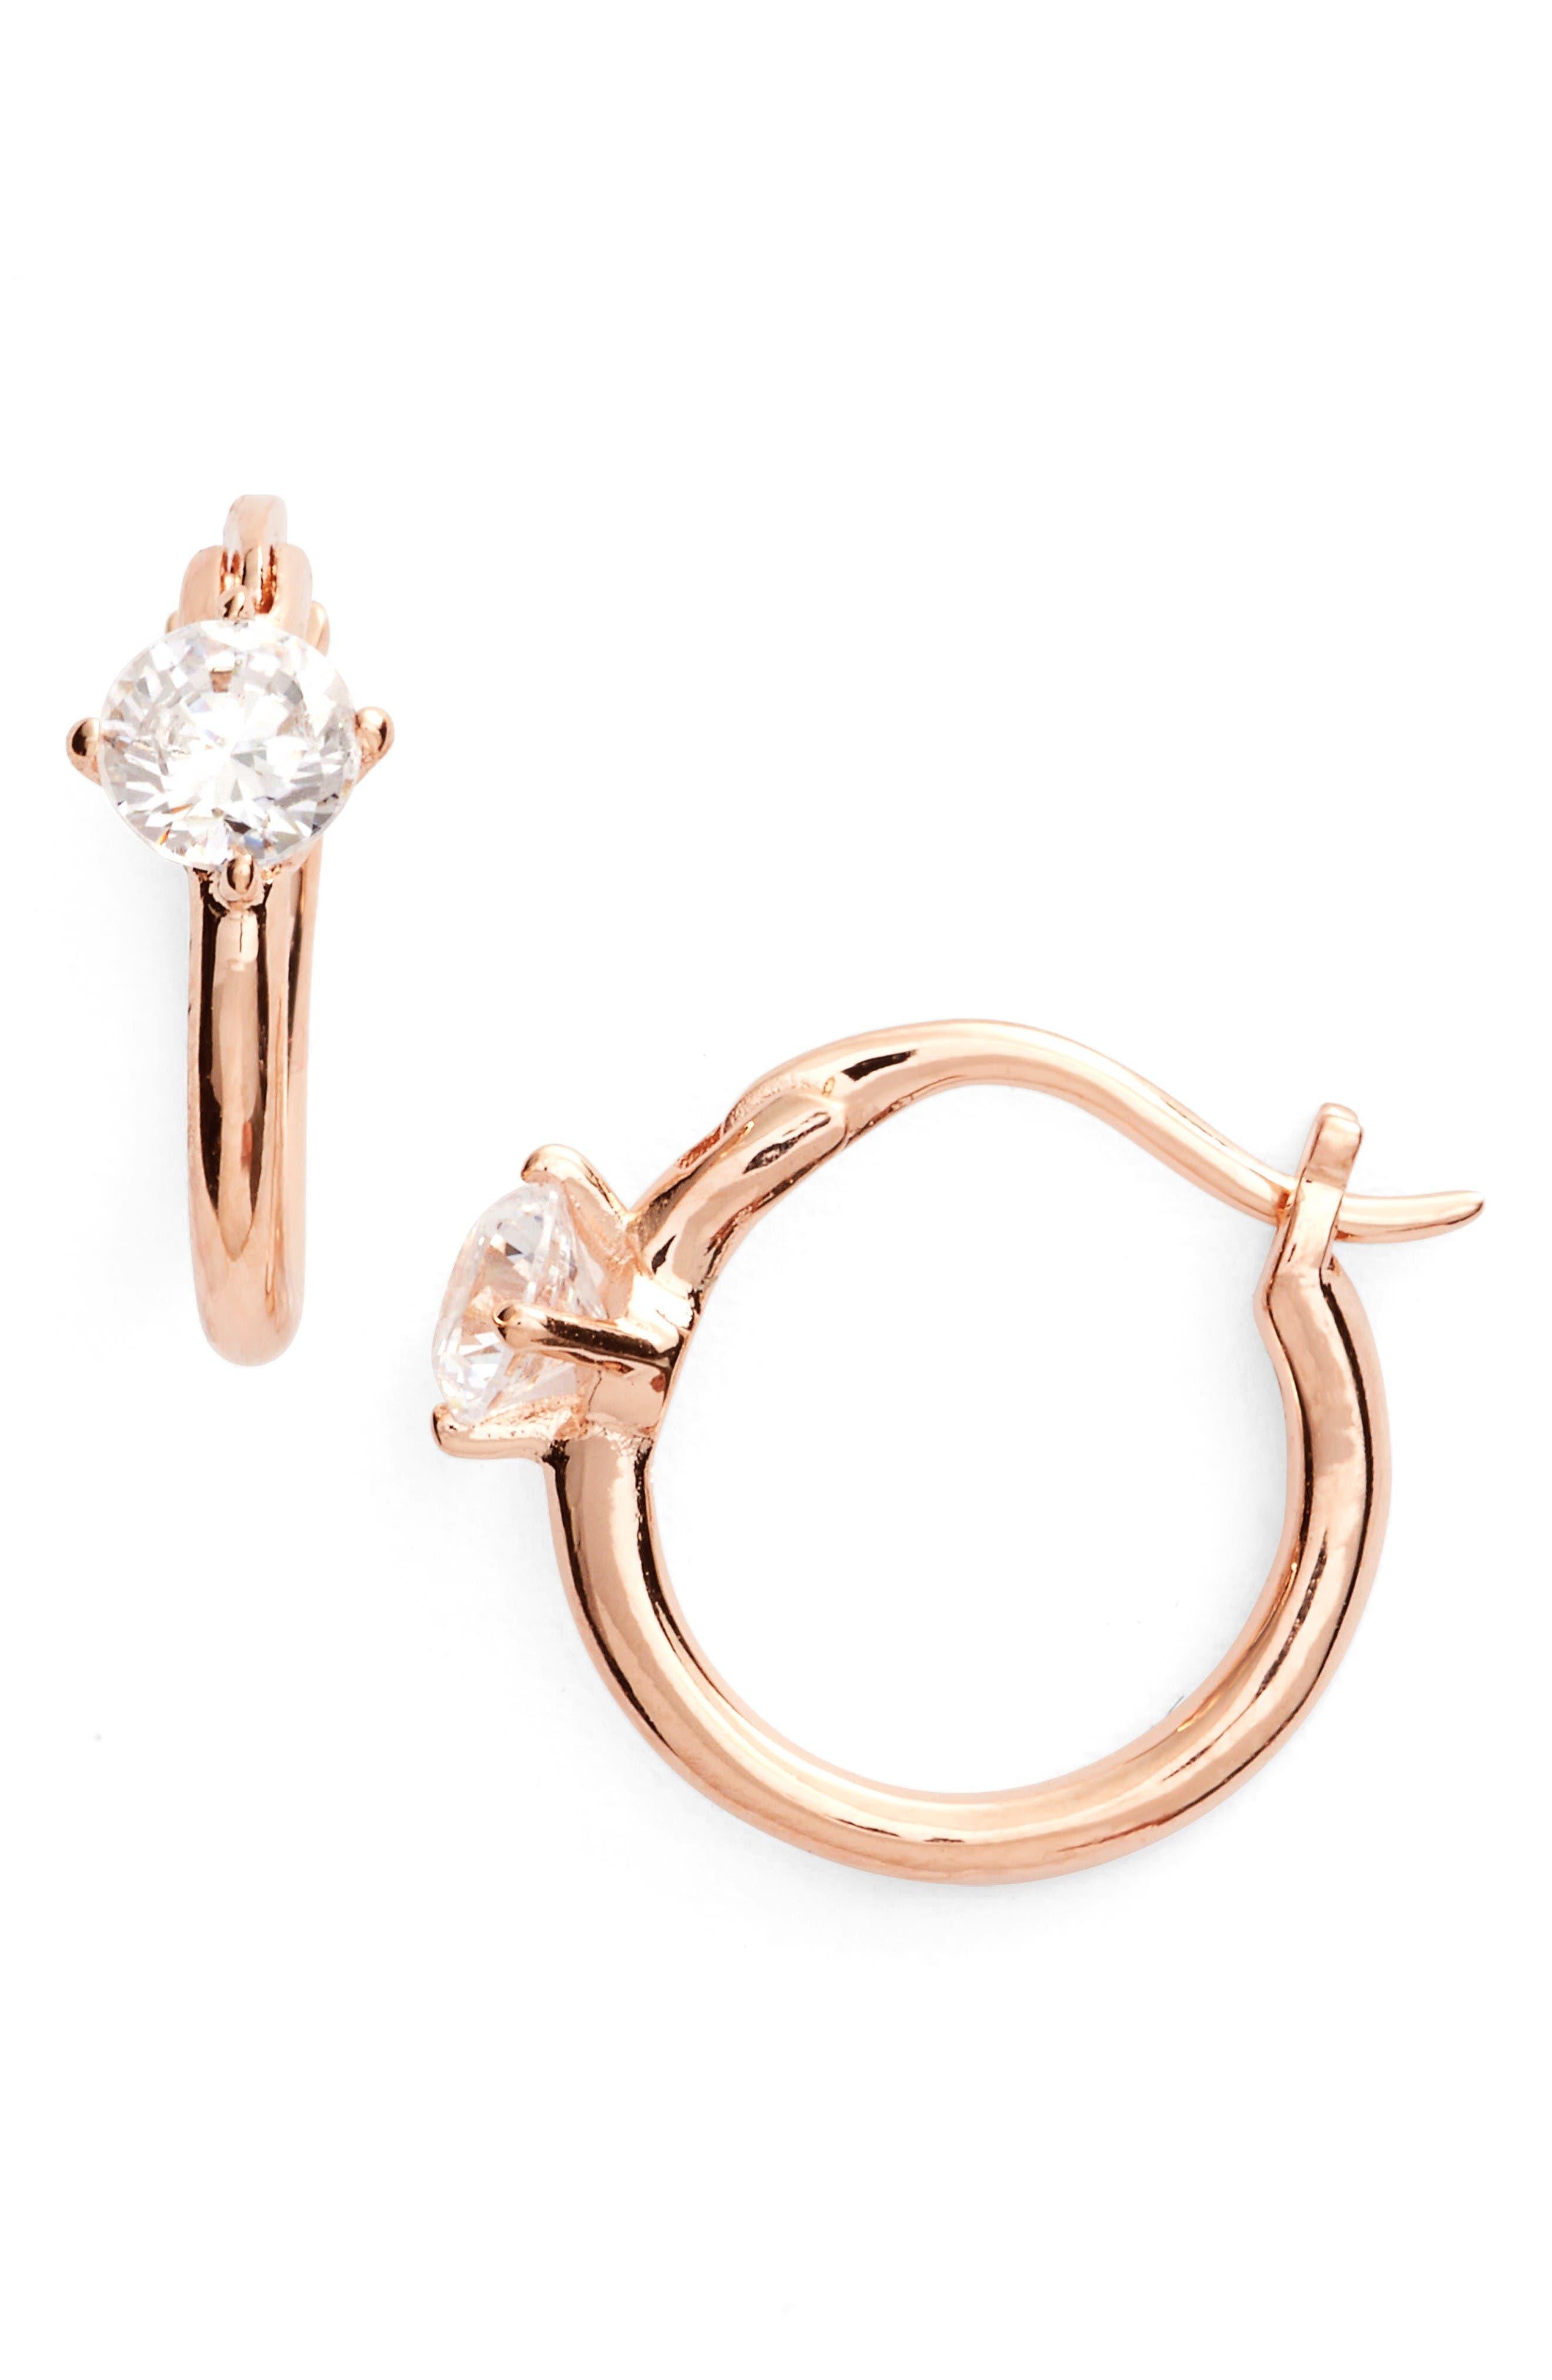 Jasmine Small Hoop Earrings,                             Main thumbnail 1, color,                             Rose Gold